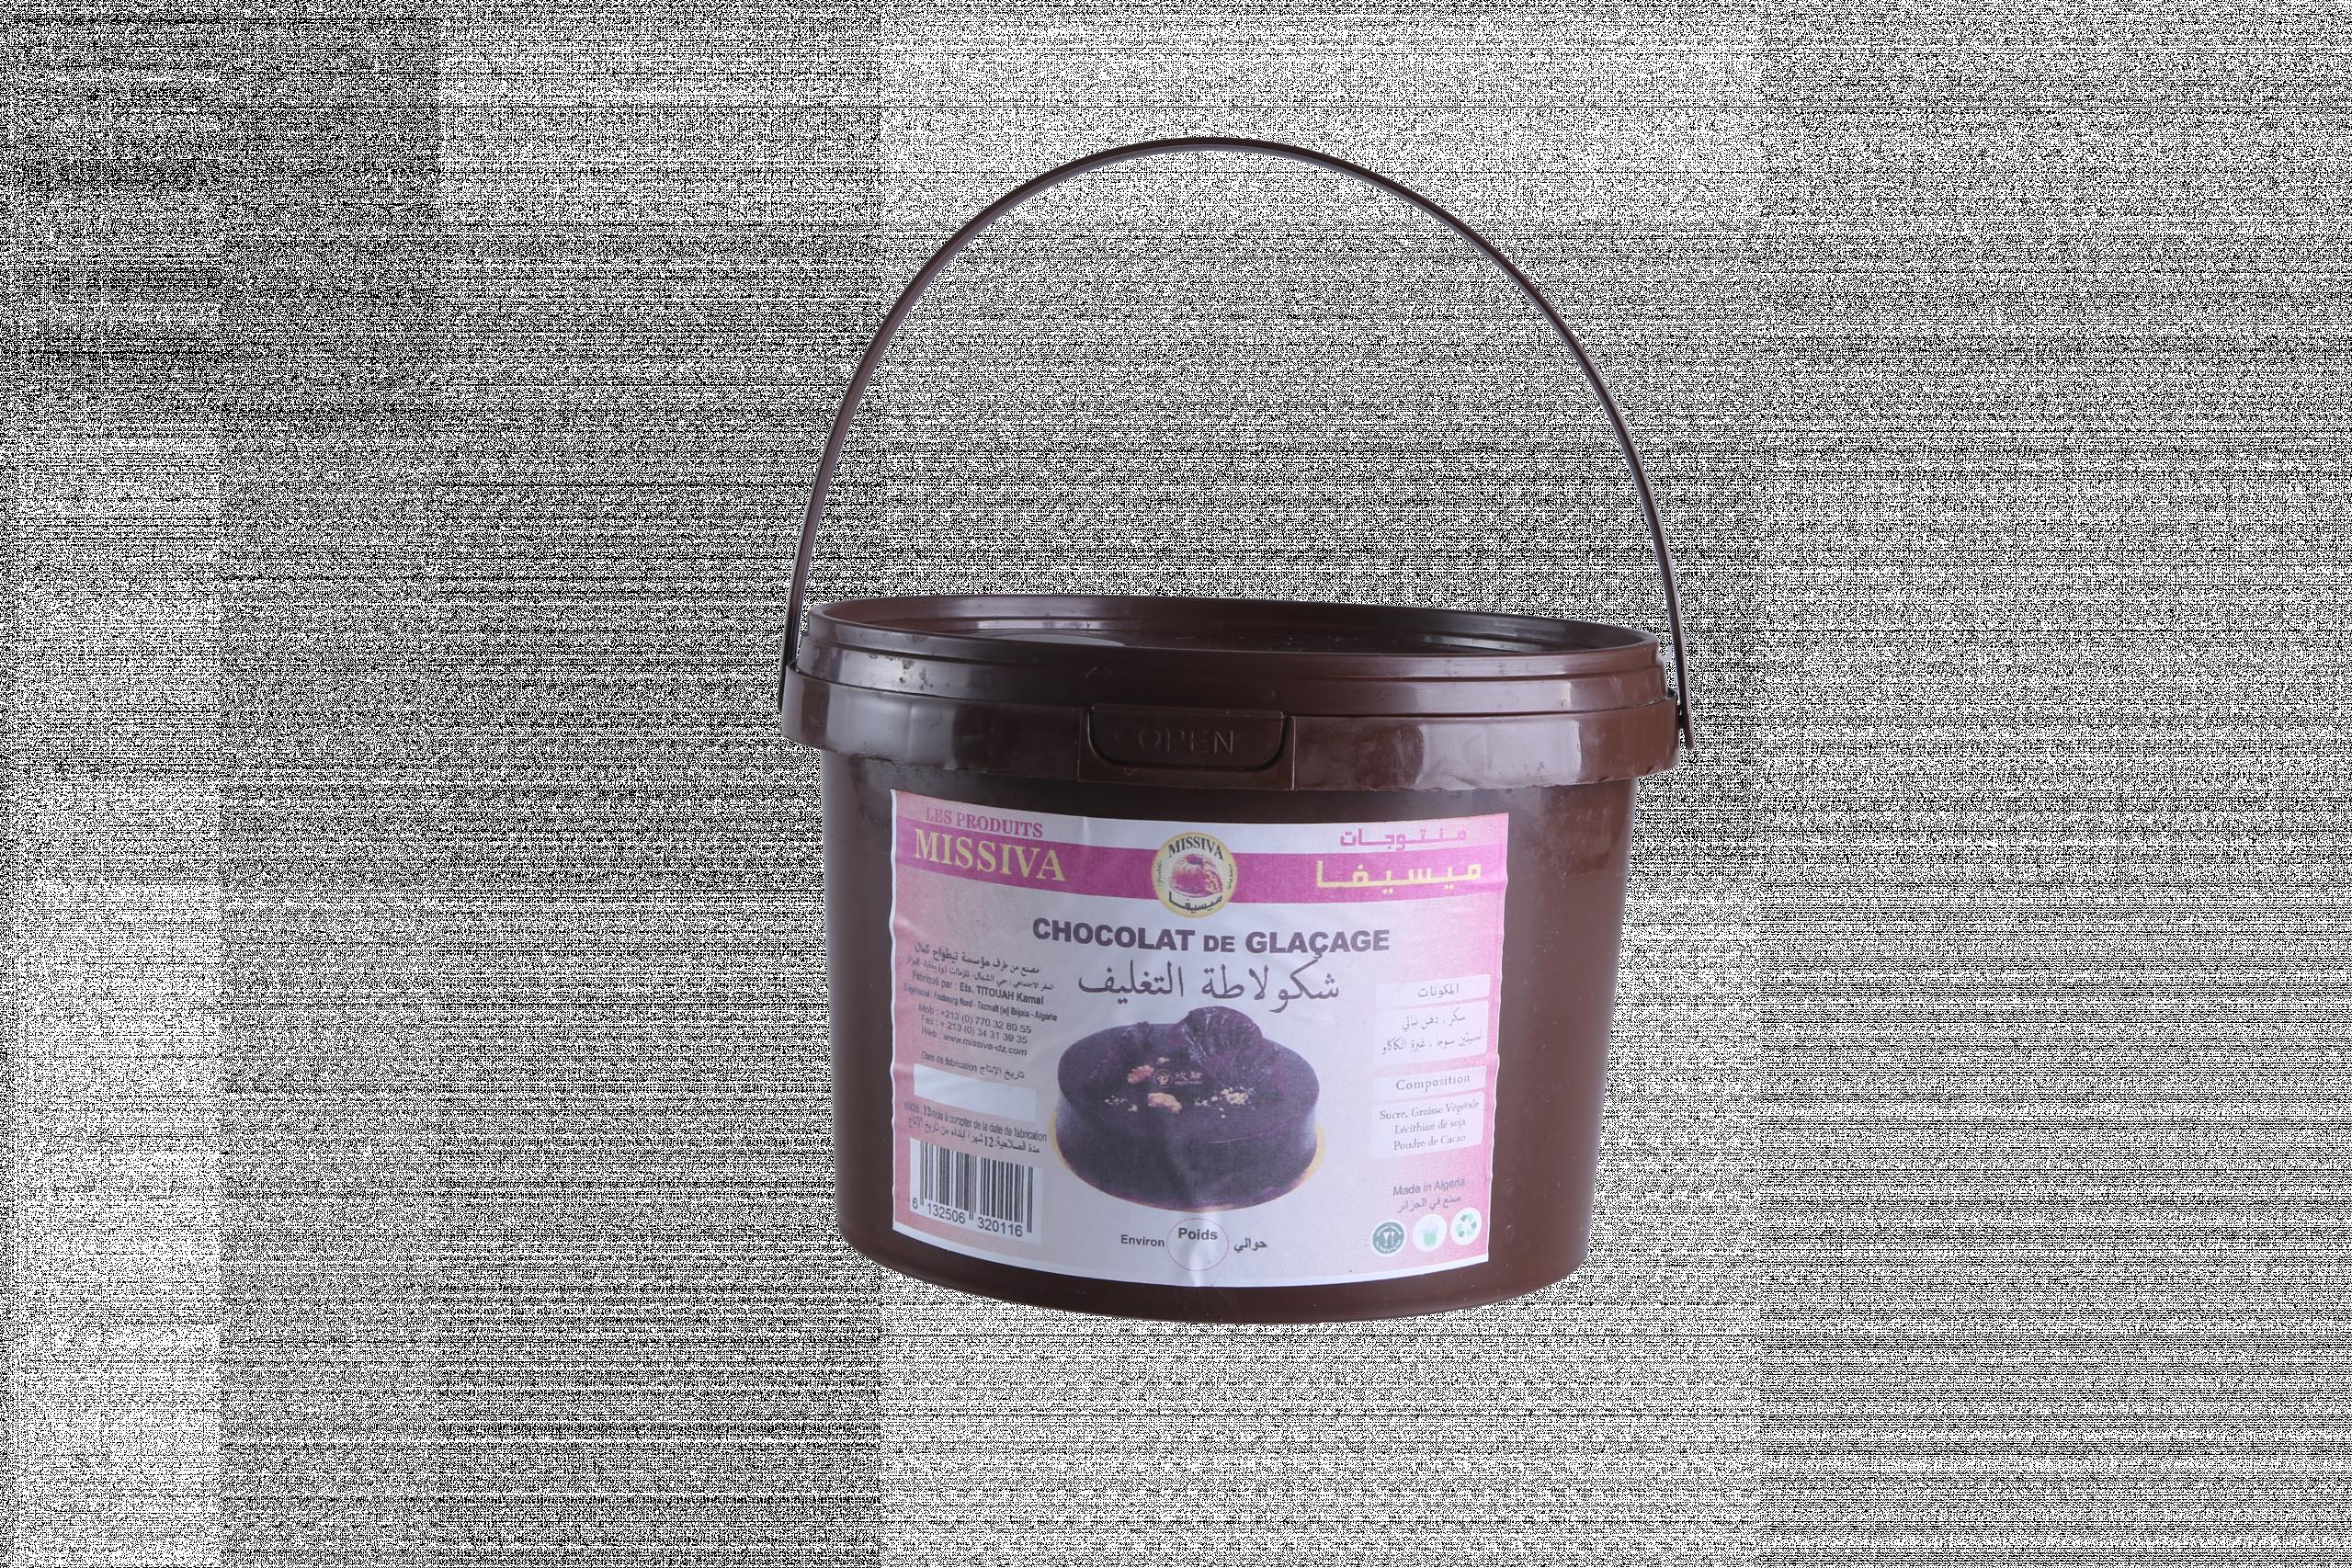 Chocolat de glaçage NOIR/ MARRON / BLANC